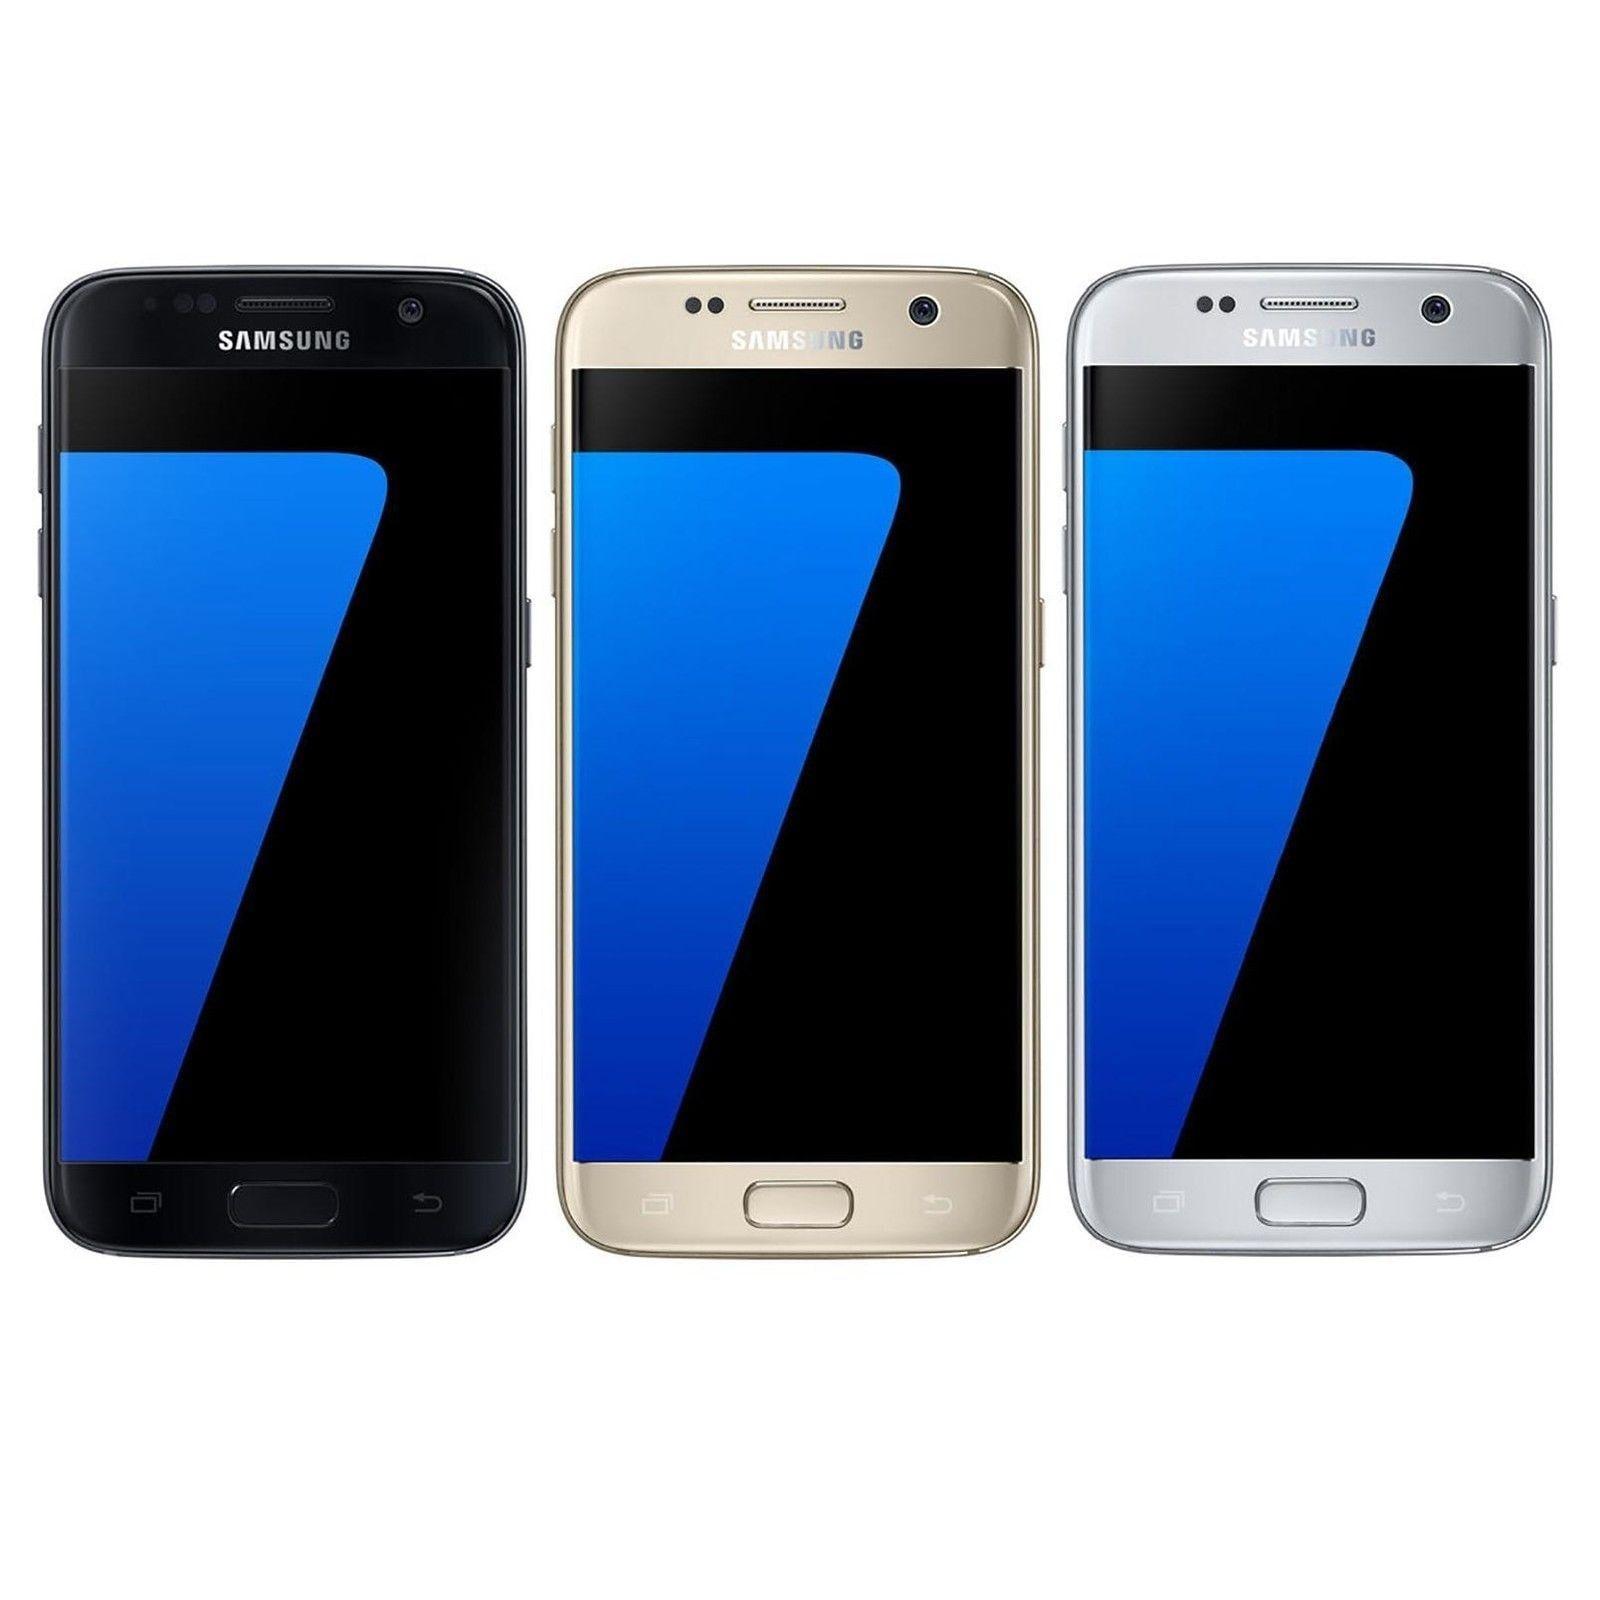 Shop Samsung Galaxy S7 G930V 32GB Verizon CDMA 4G LTE Quad Core Phone Certified Refurbished